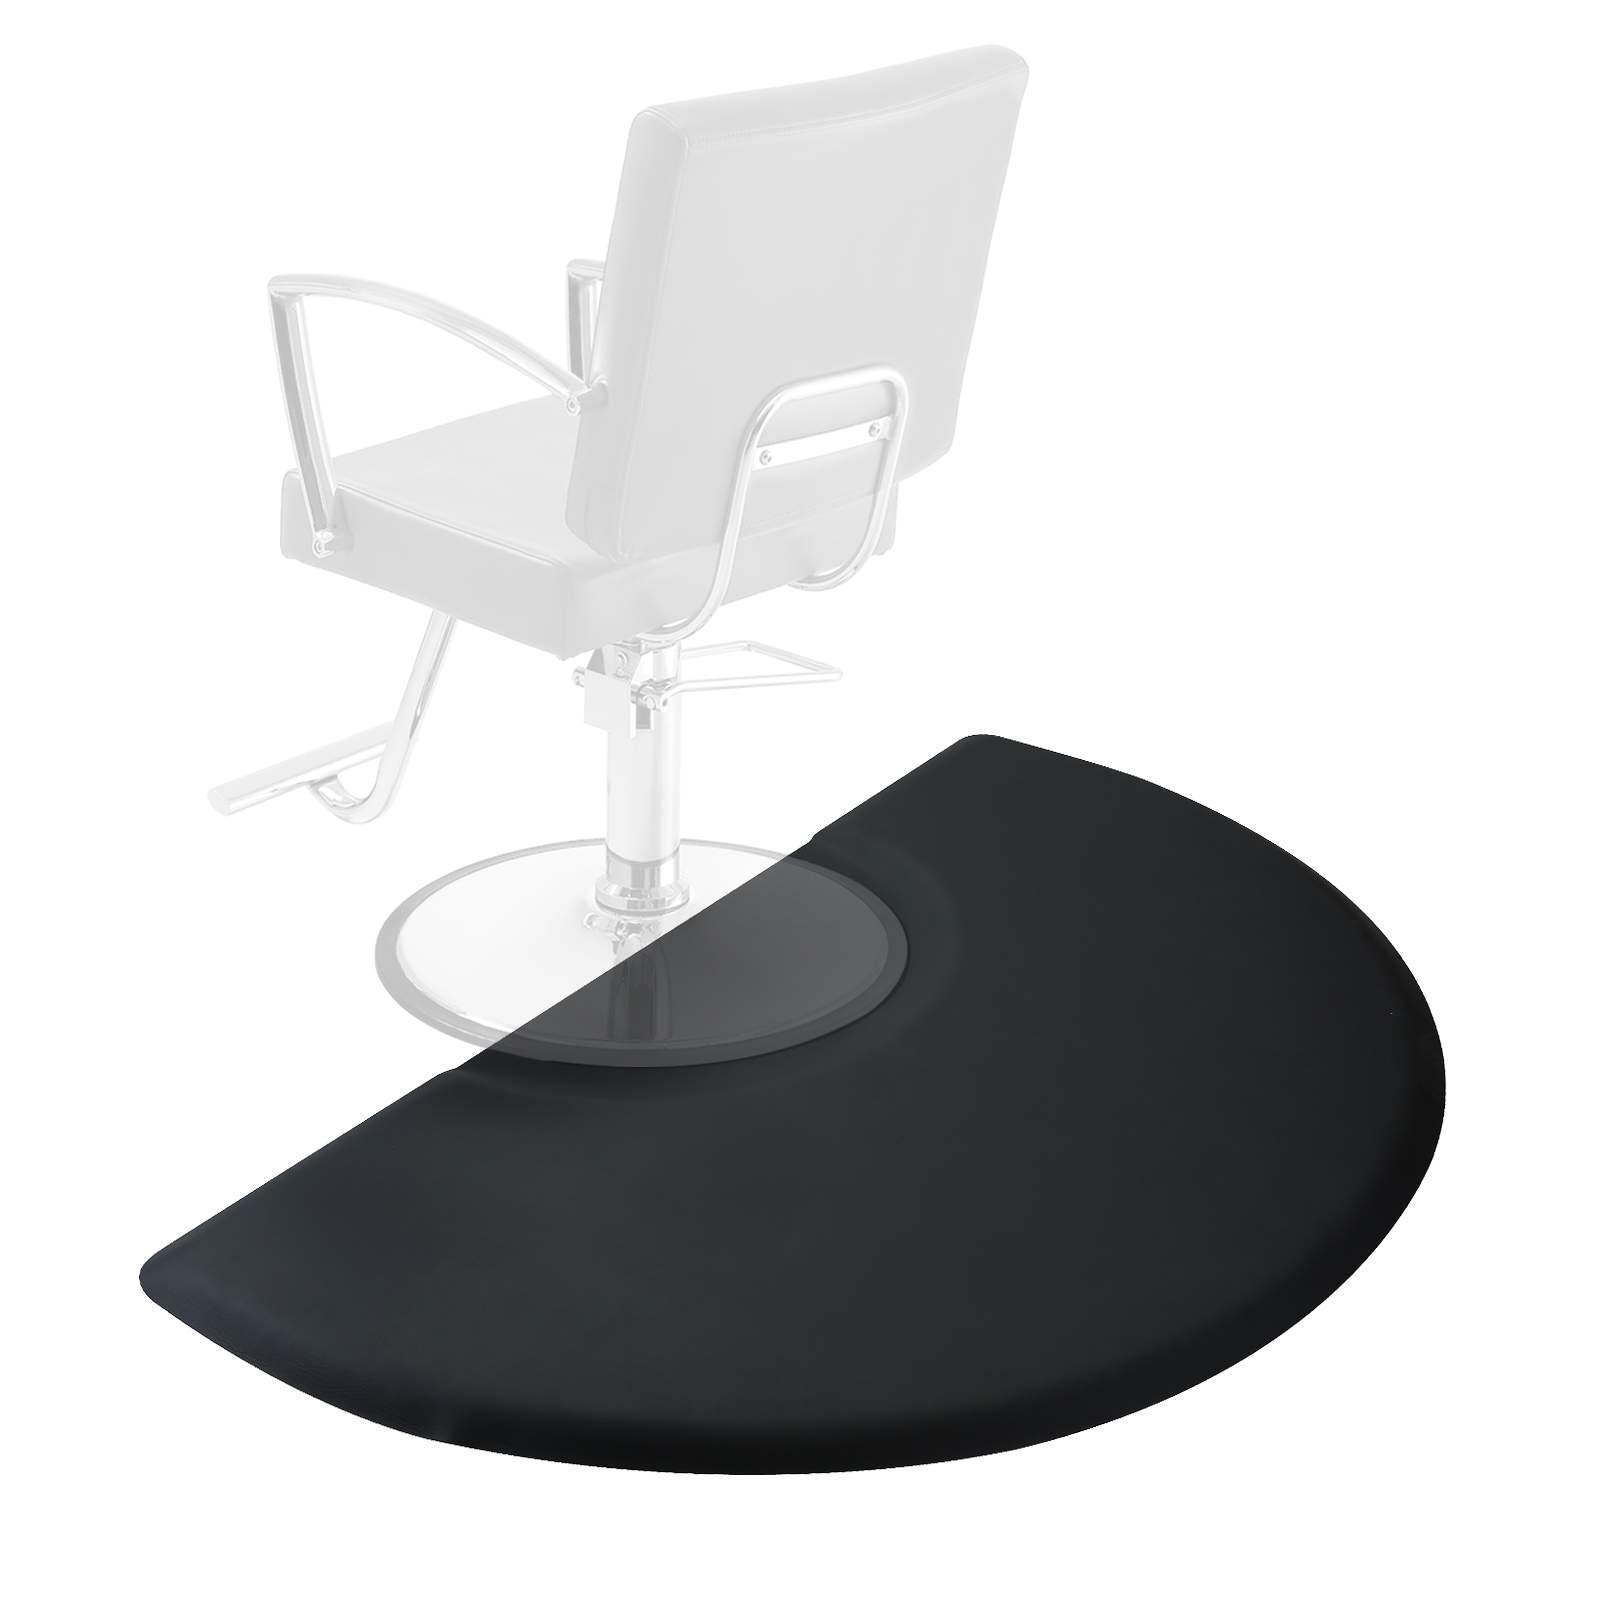 Barber Floor Mats for Sale Mix wholesale Saloniture 3 Ft X 5 Ft Salon Barber Shop Chair